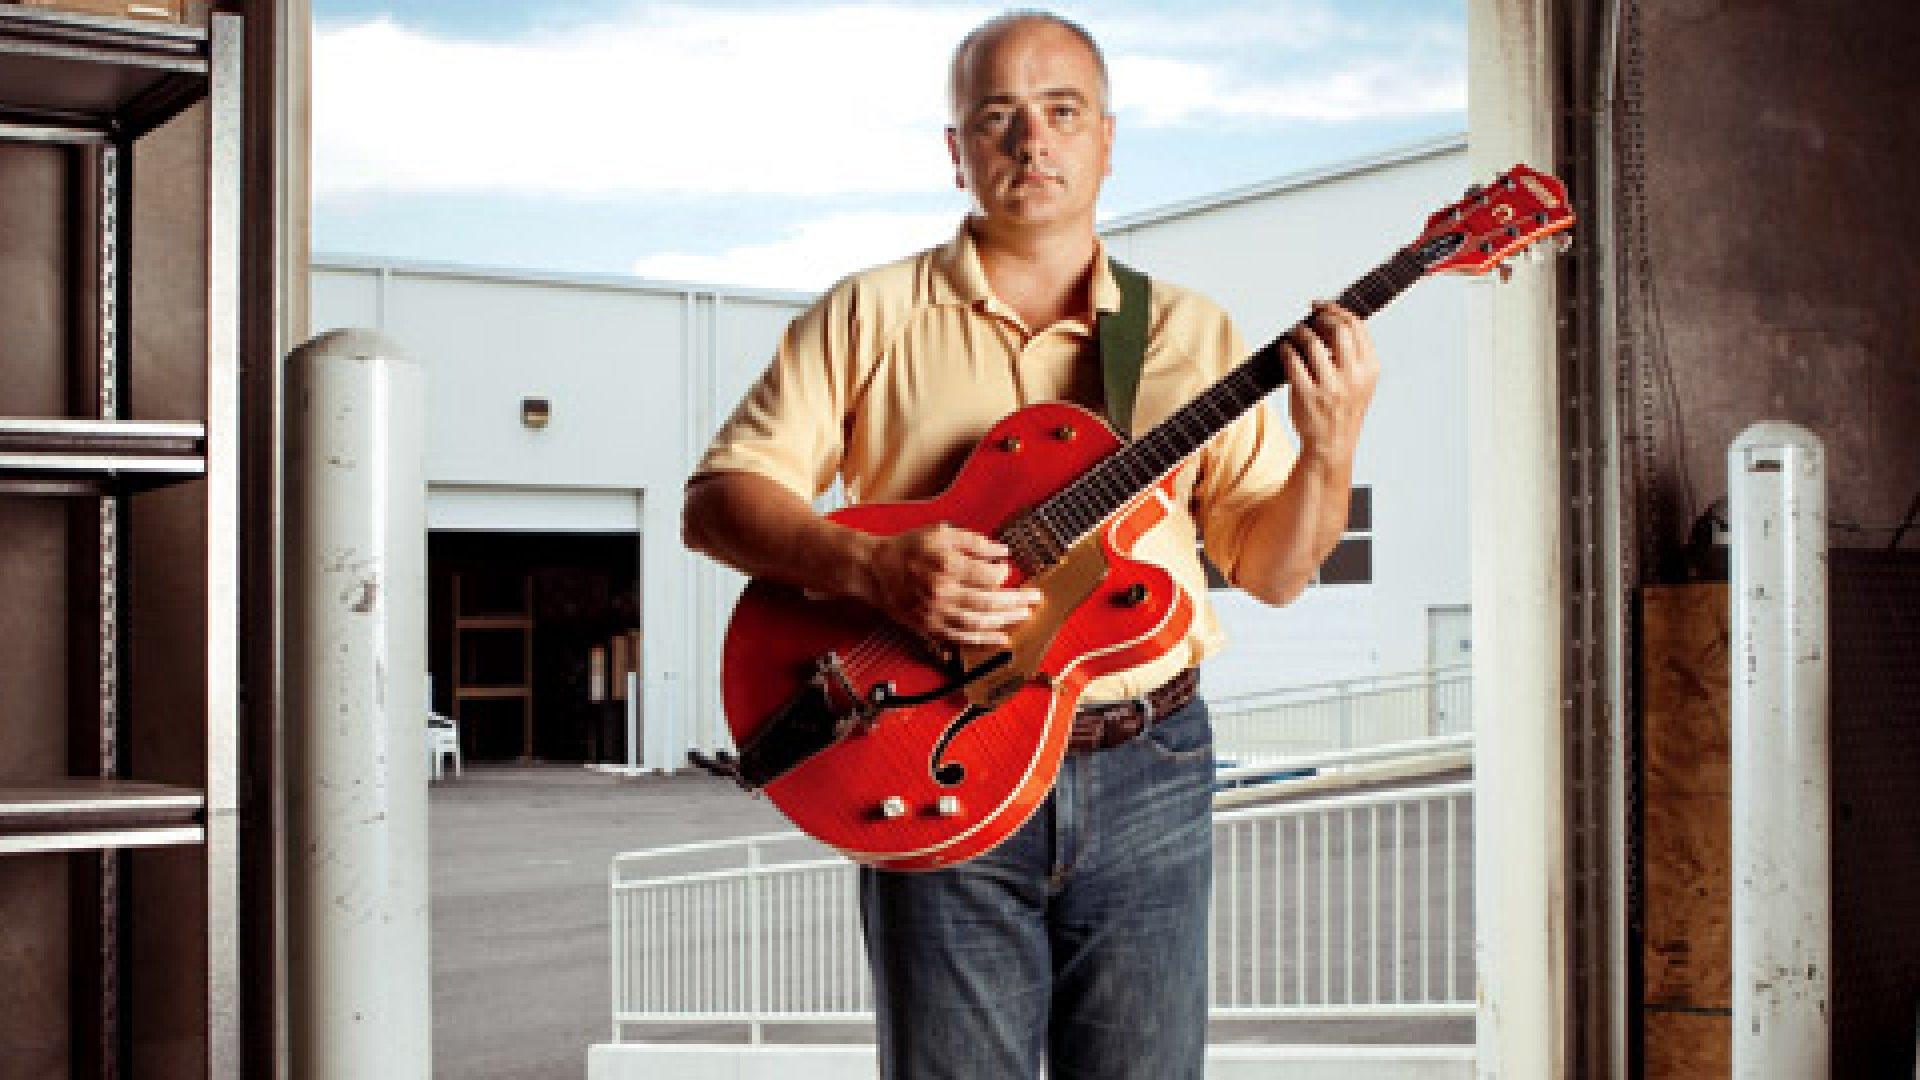 <strong>JAM SESSION</strong> Jim Basara has 175 guitars at his disposal, including this $3,000 Gretsch Brian Setzer.